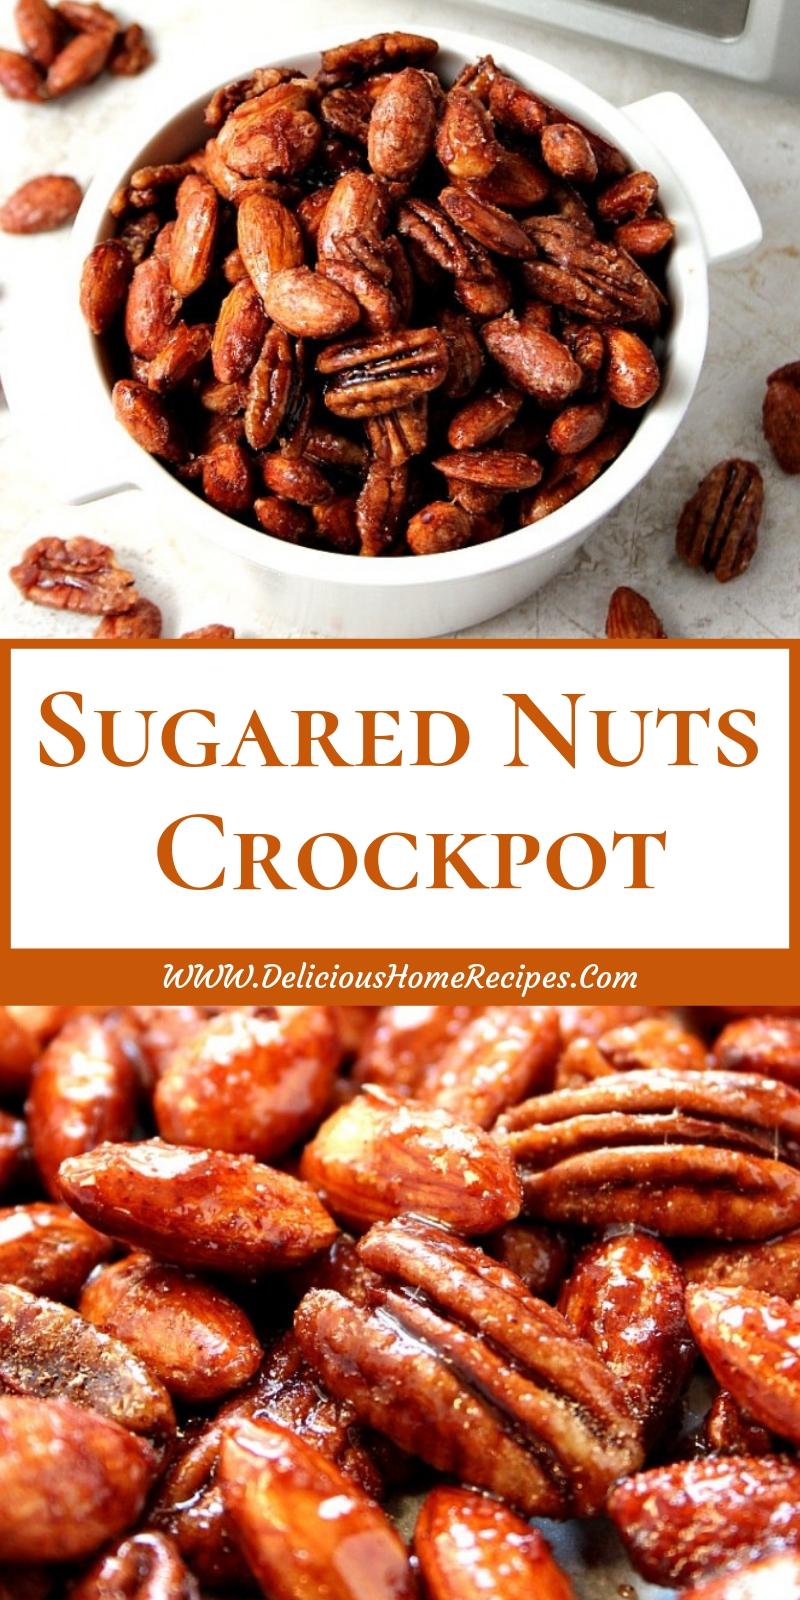 Sugared Nuts Crockpot